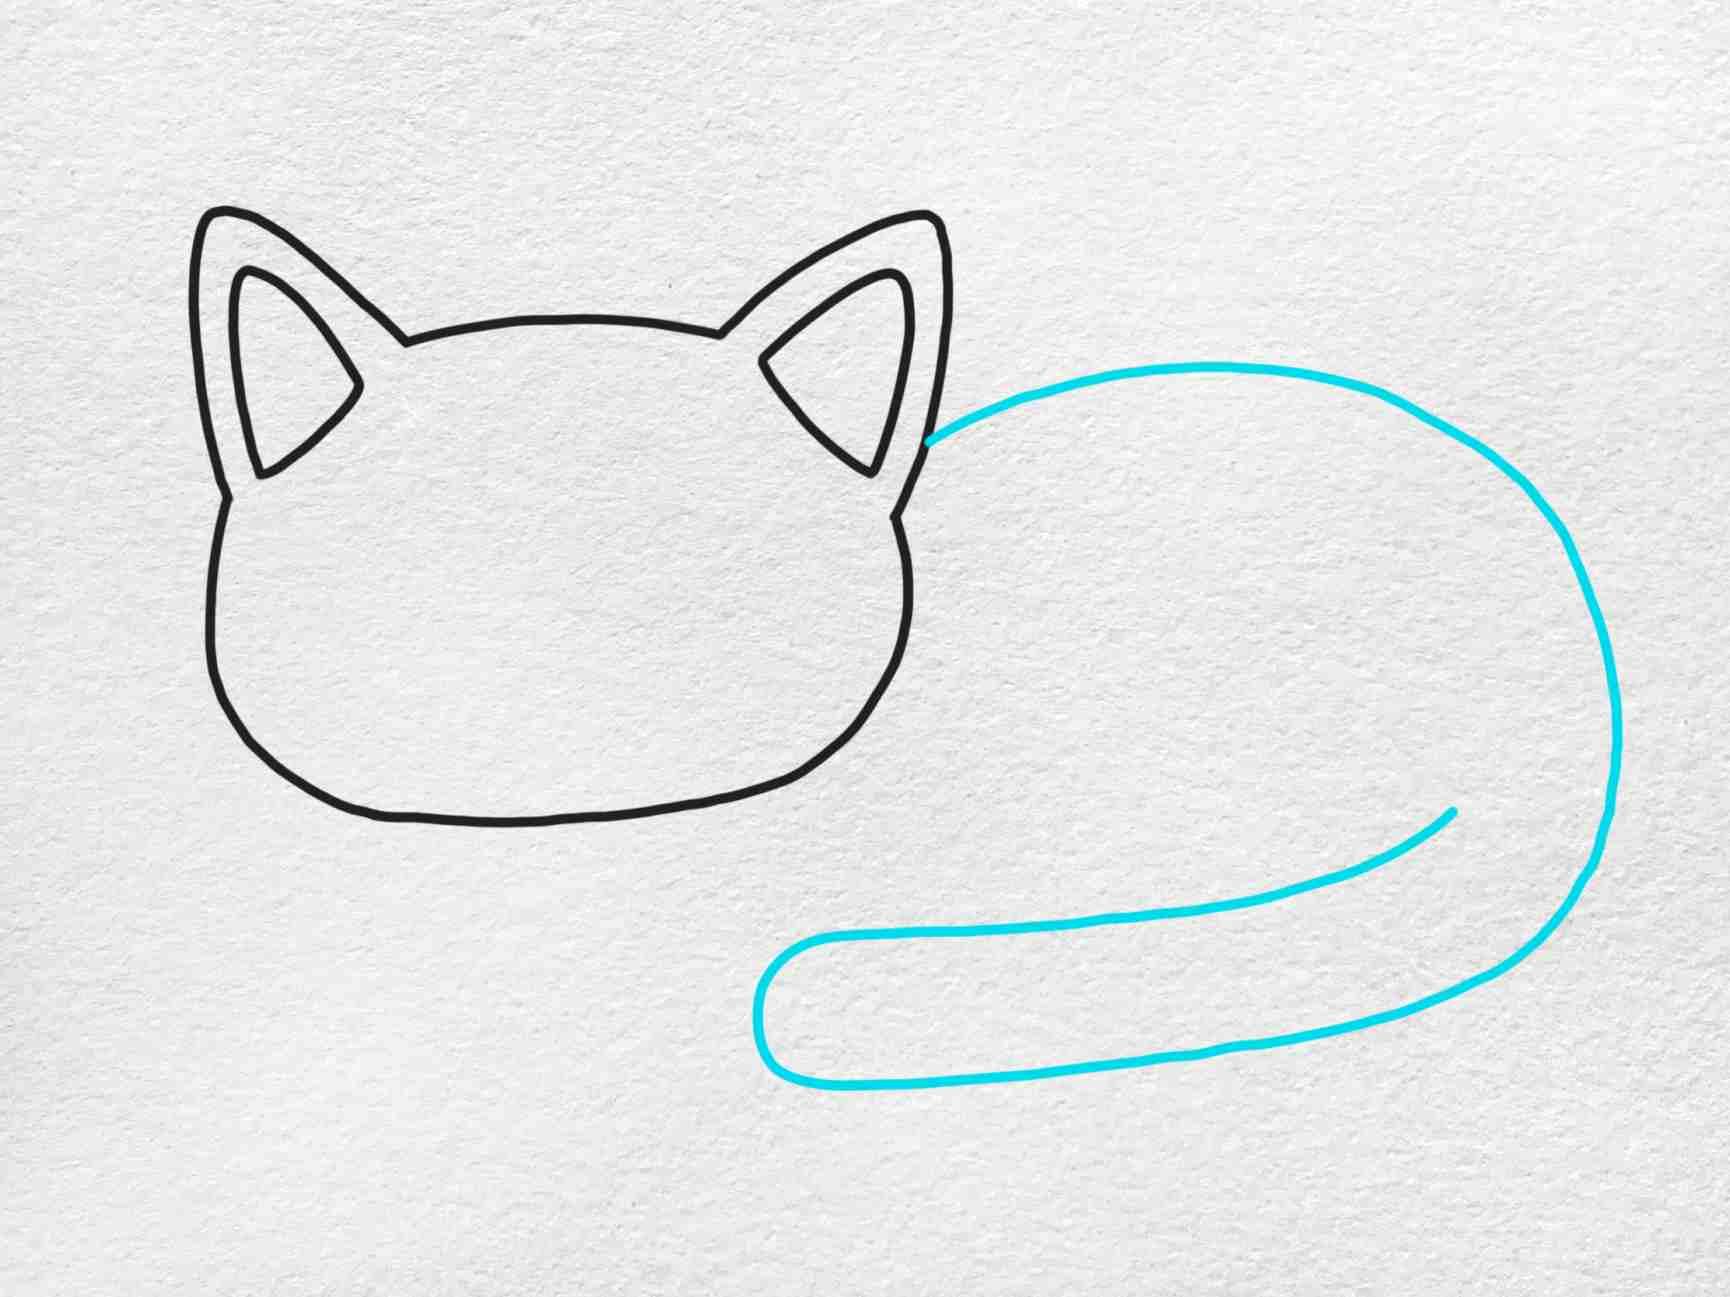 Fat Cat Drawing: Step 3